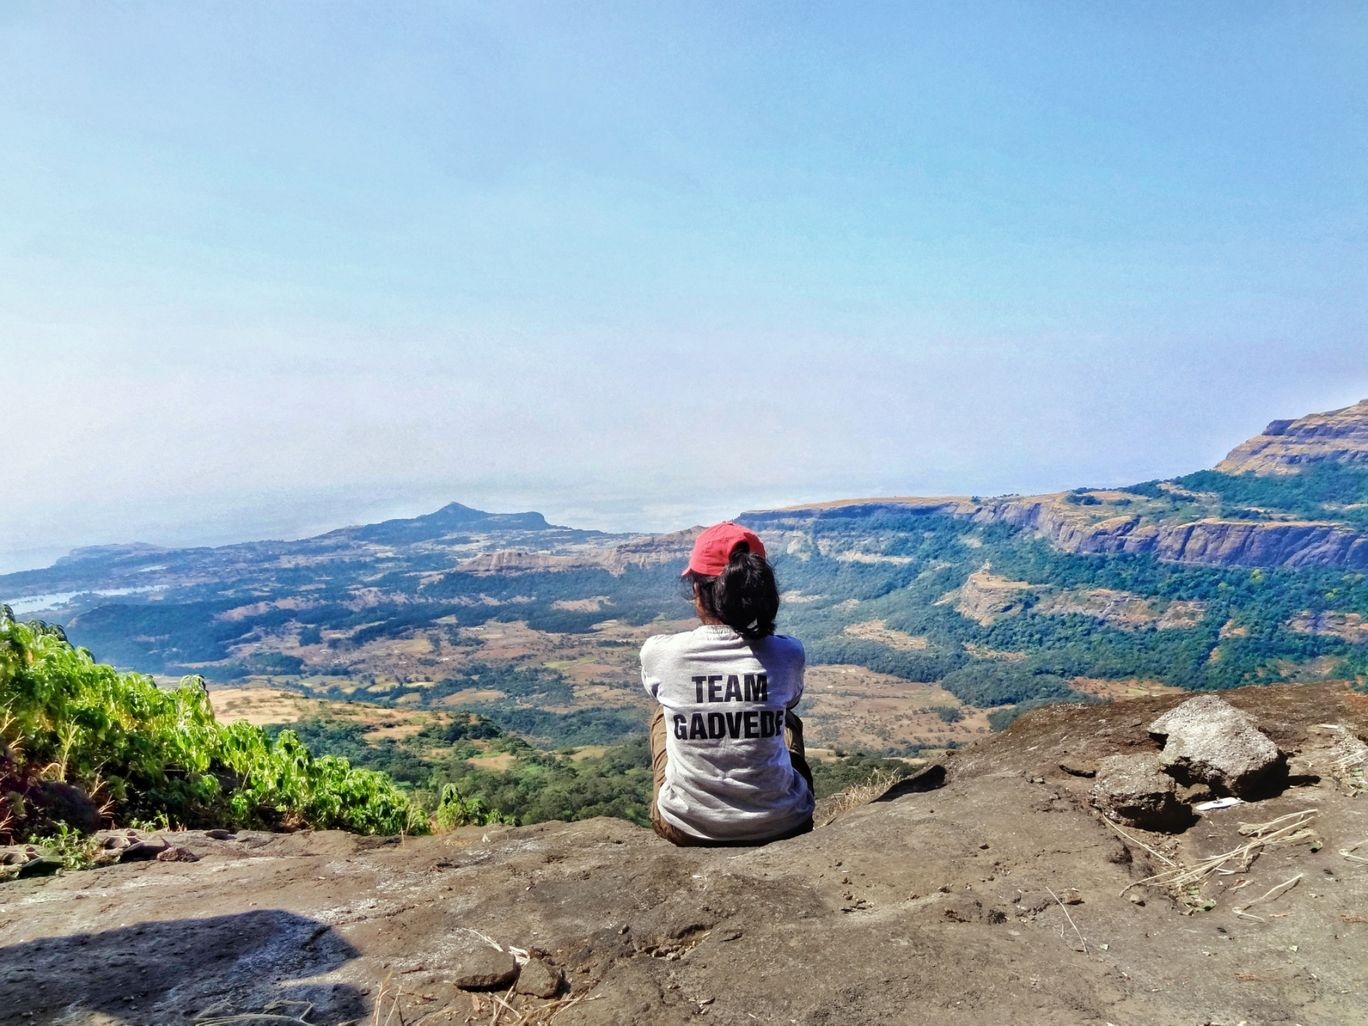 Photo of Pune By Ashwini Kshirsagar